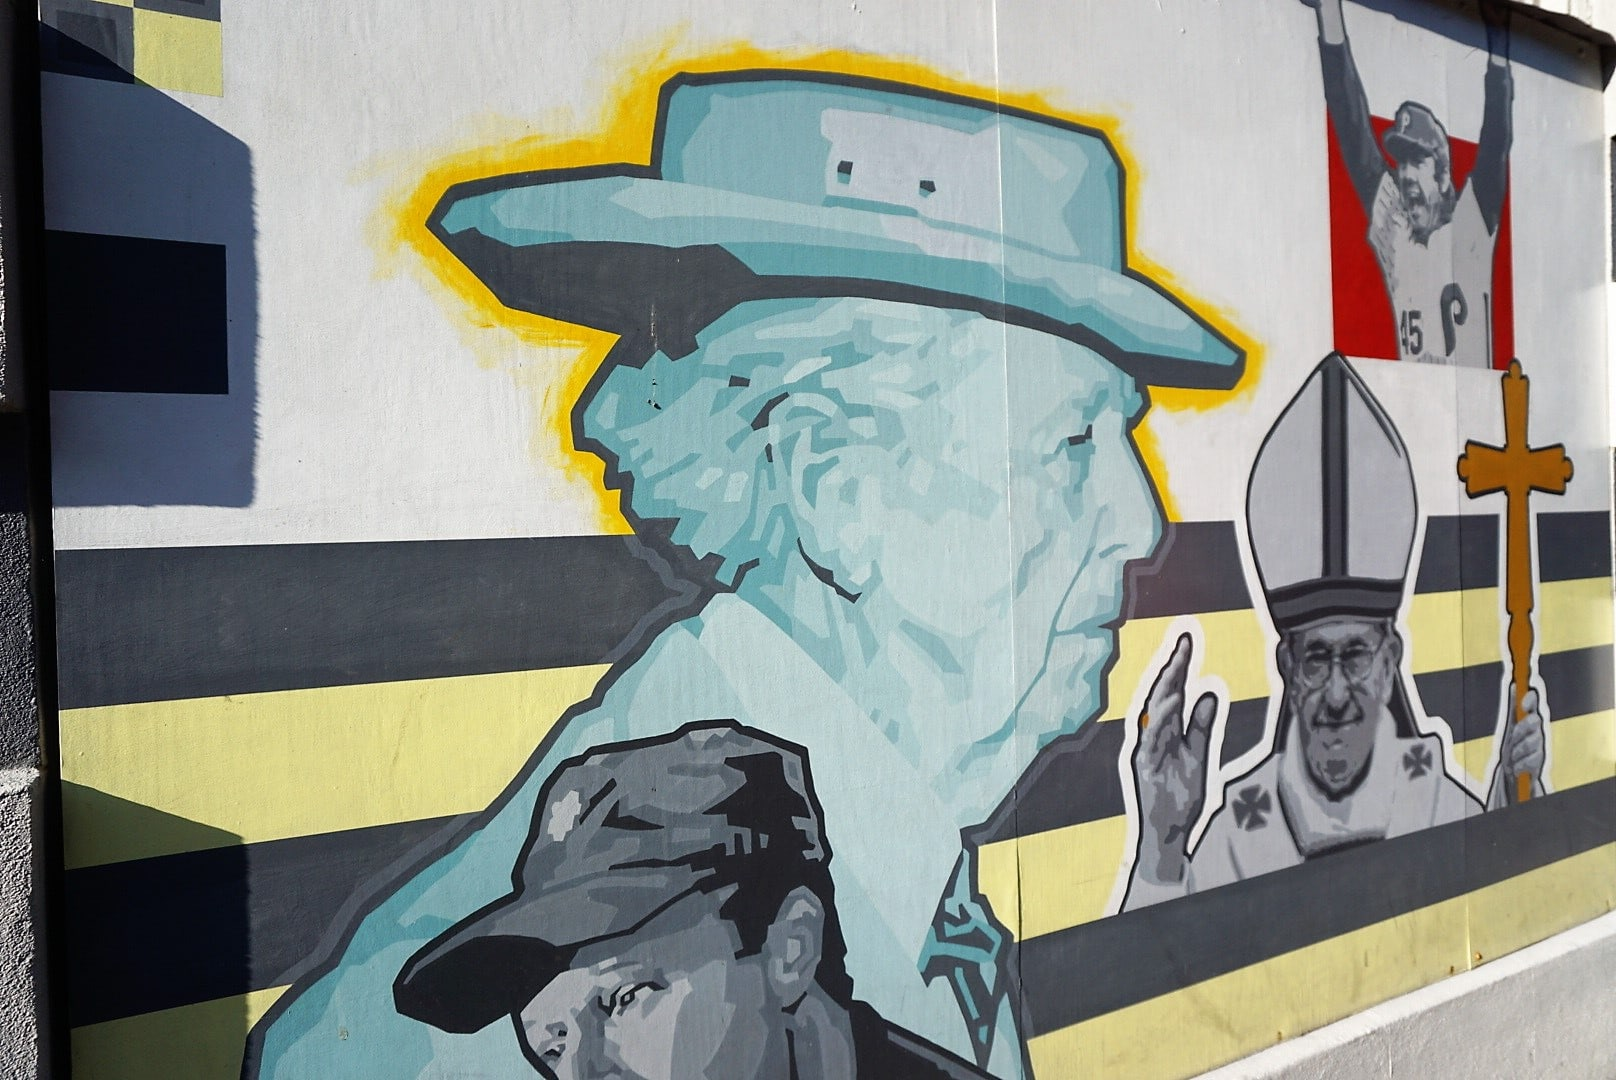 Dirty Franks Mural in Philadelphia